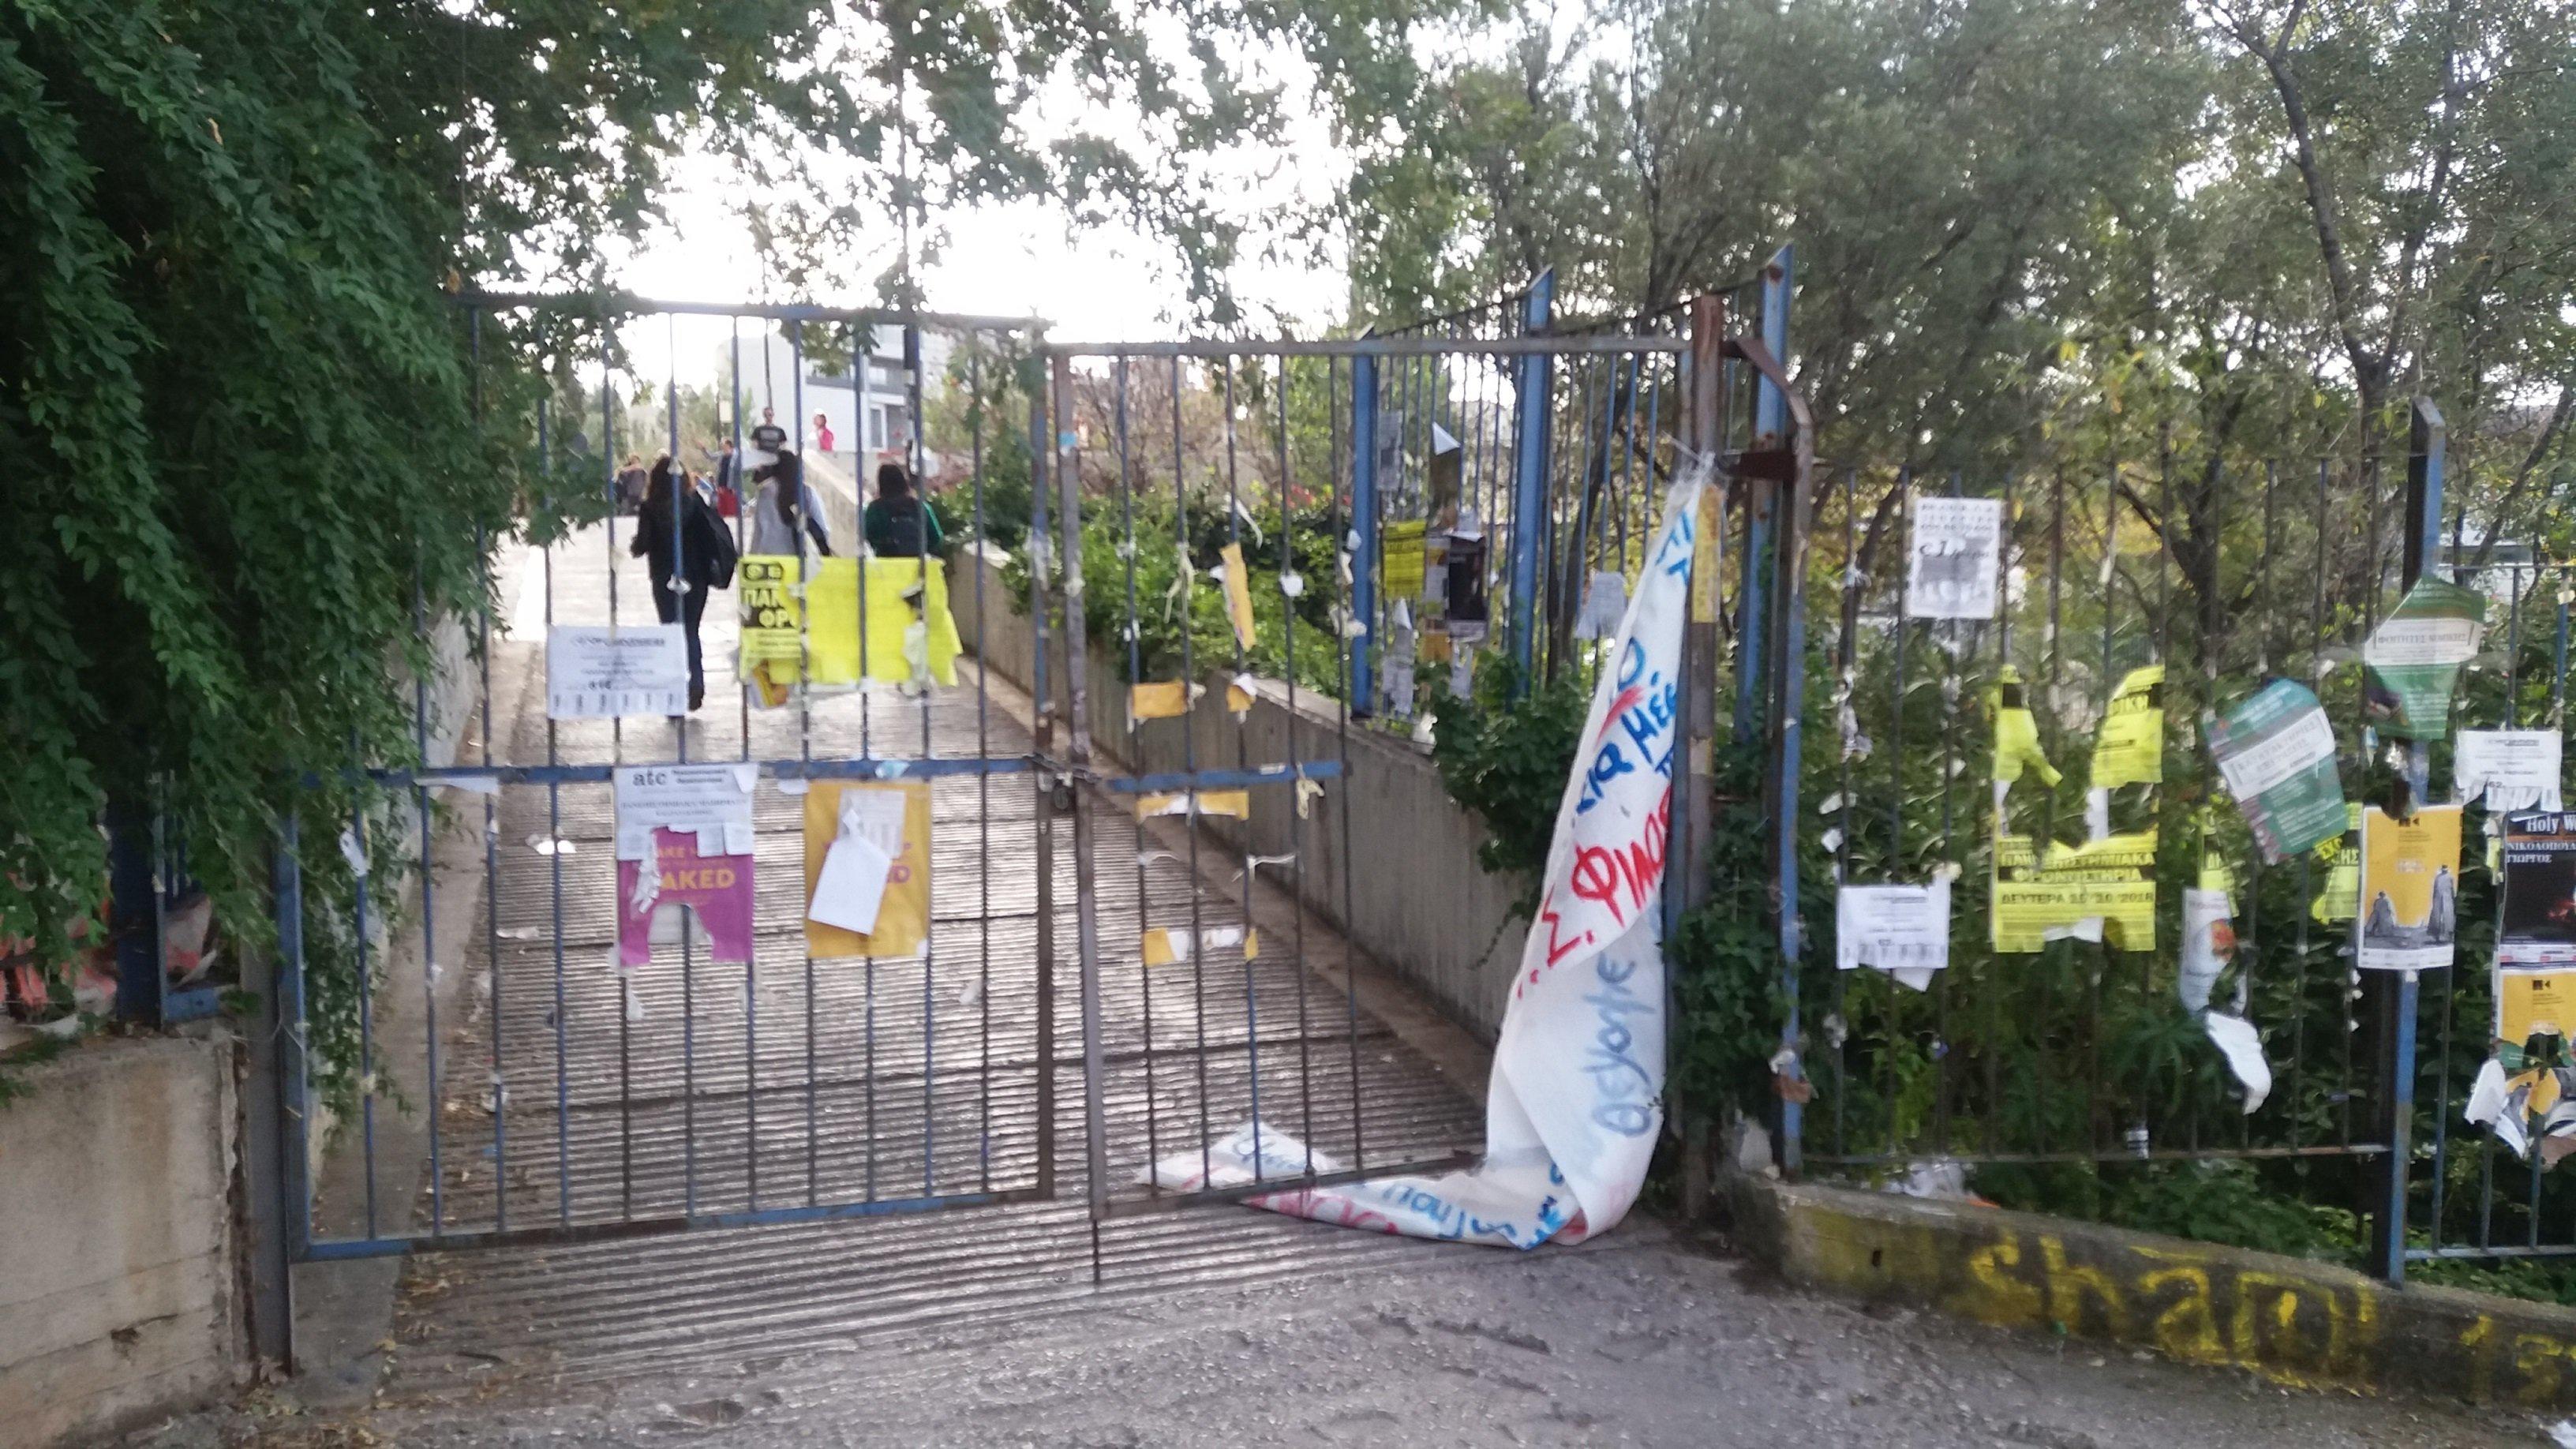 O Ρουβίκωνας επιμένει να στήσει γλέντι στην κλειστή Φιλοσοφική Σχολή